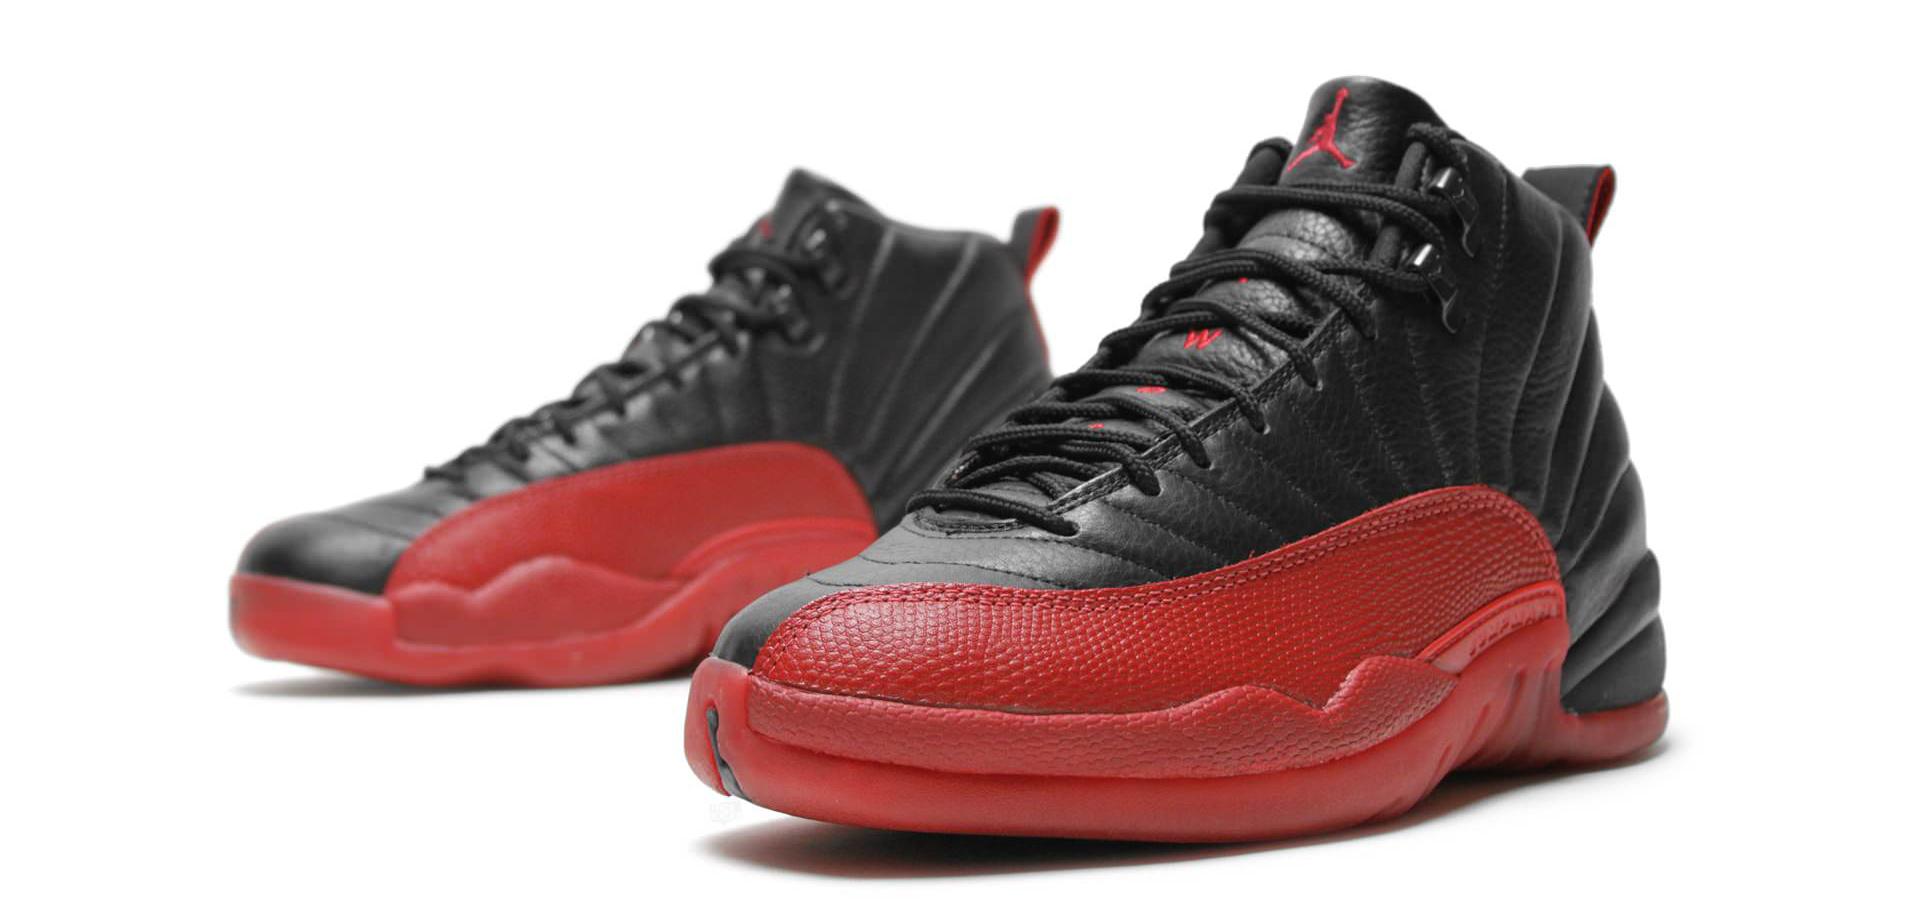 Air Jordan 12+13 Womens Red Black White shoes